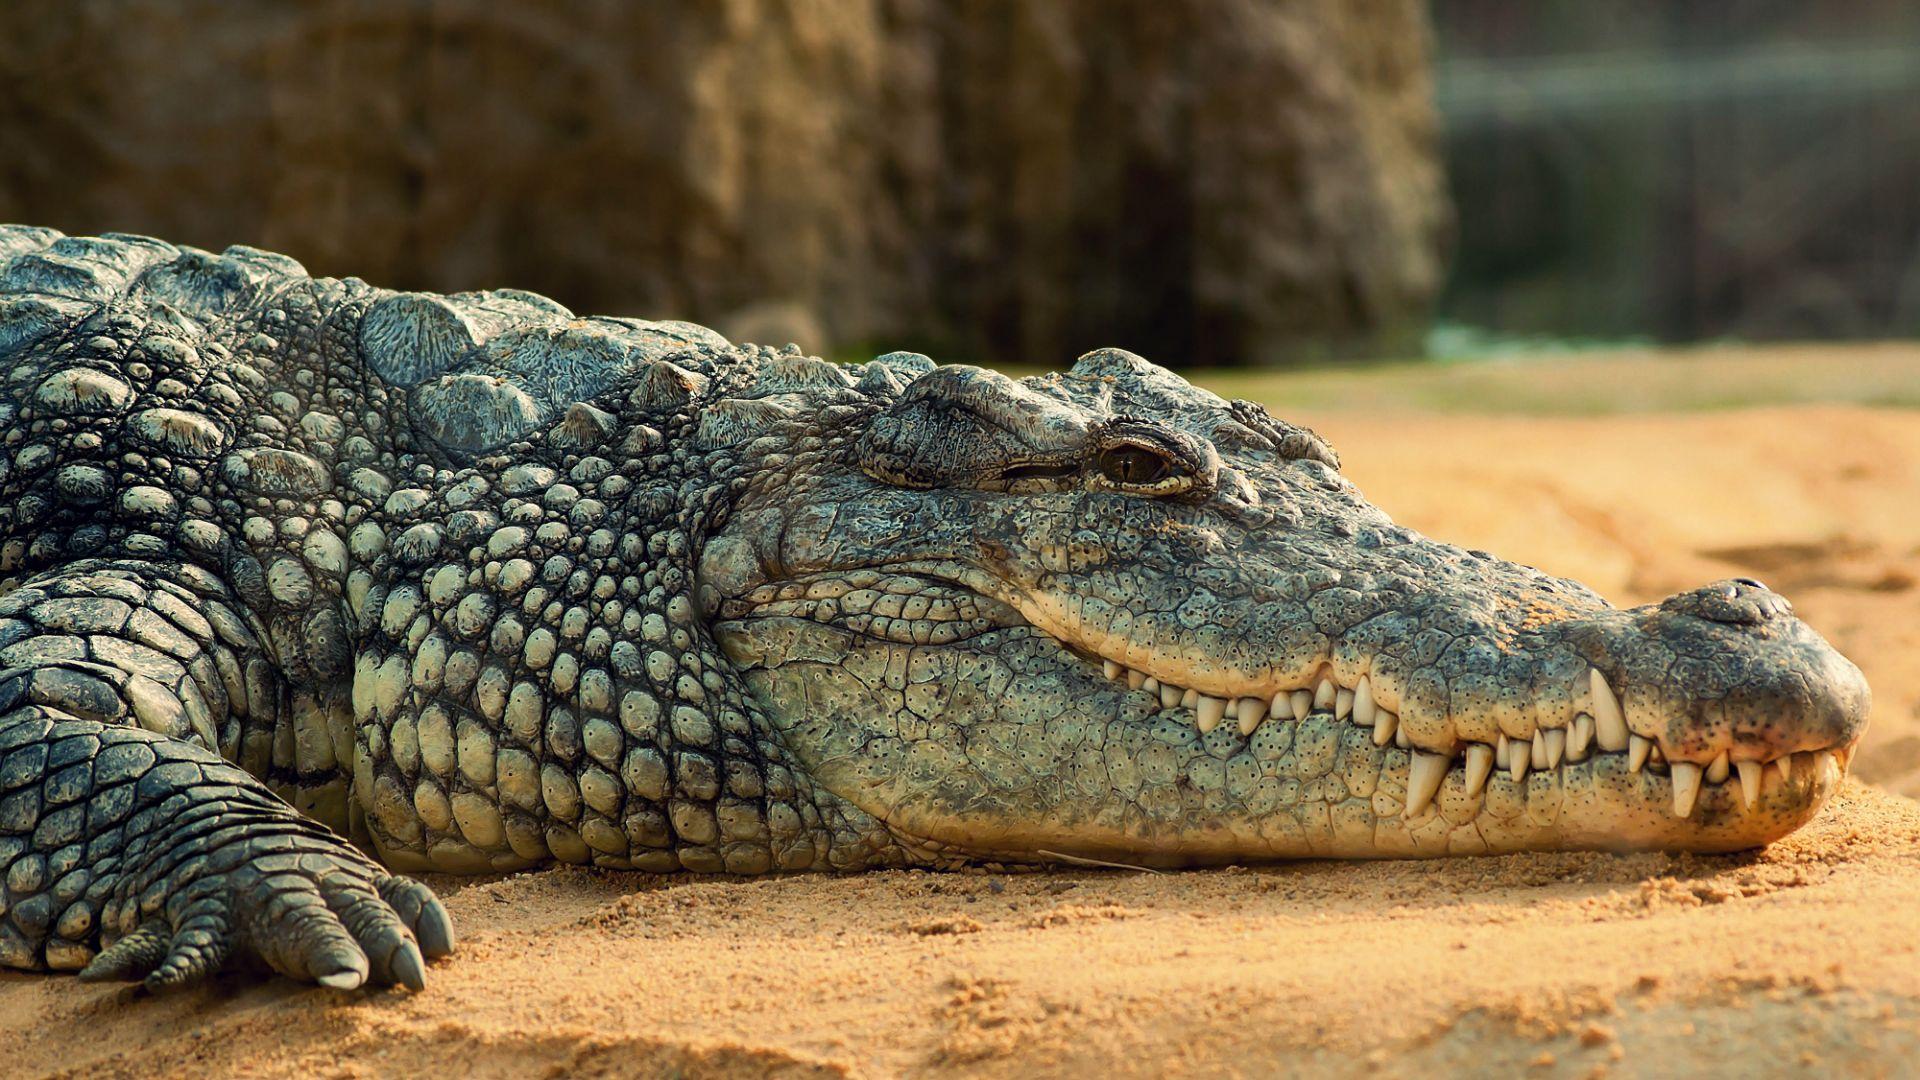 Crocodile hd wallpaper 1080